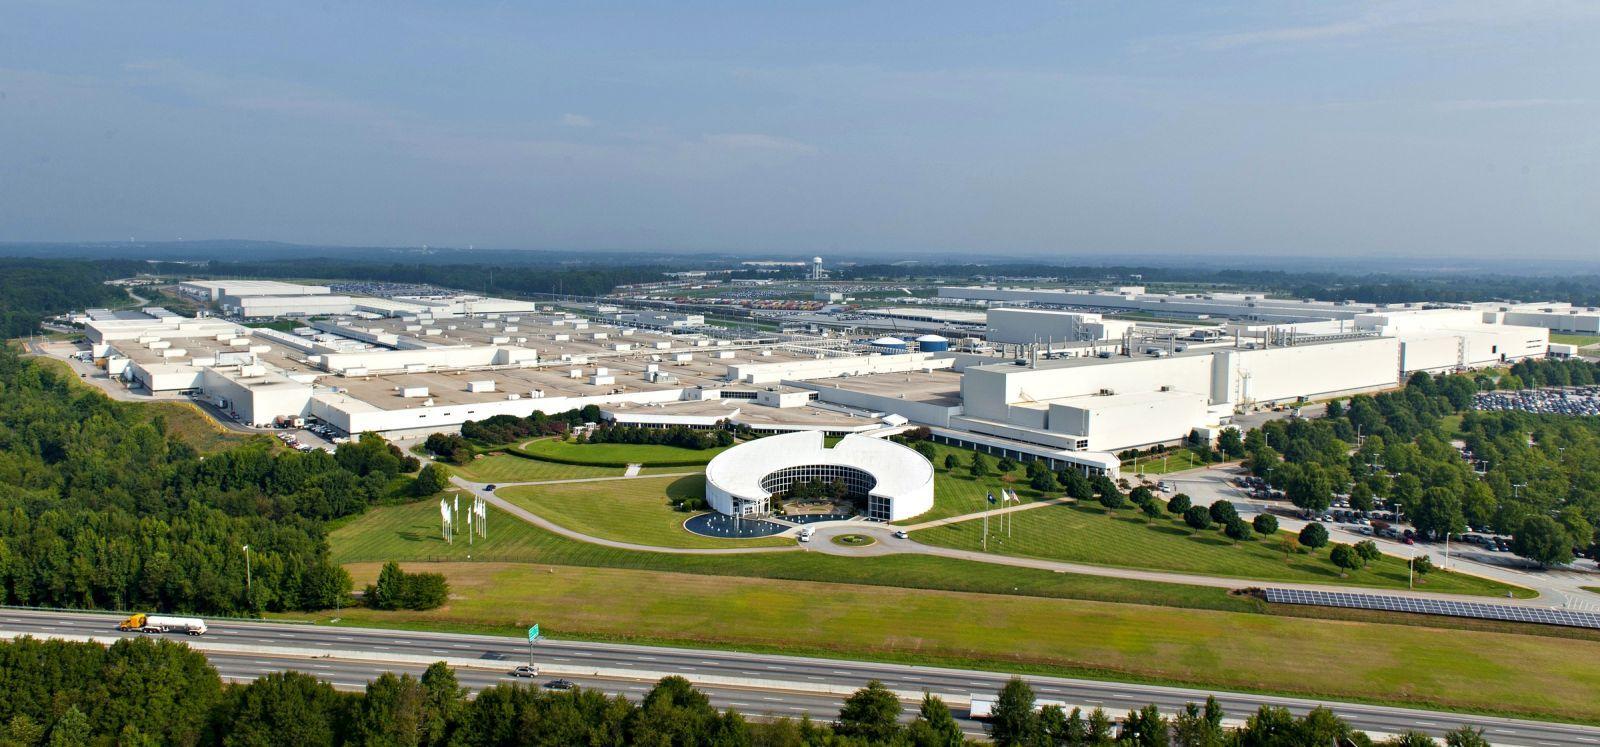 BMW Plant, Spartanburg, South Carolina -  Aerial Photo 2014